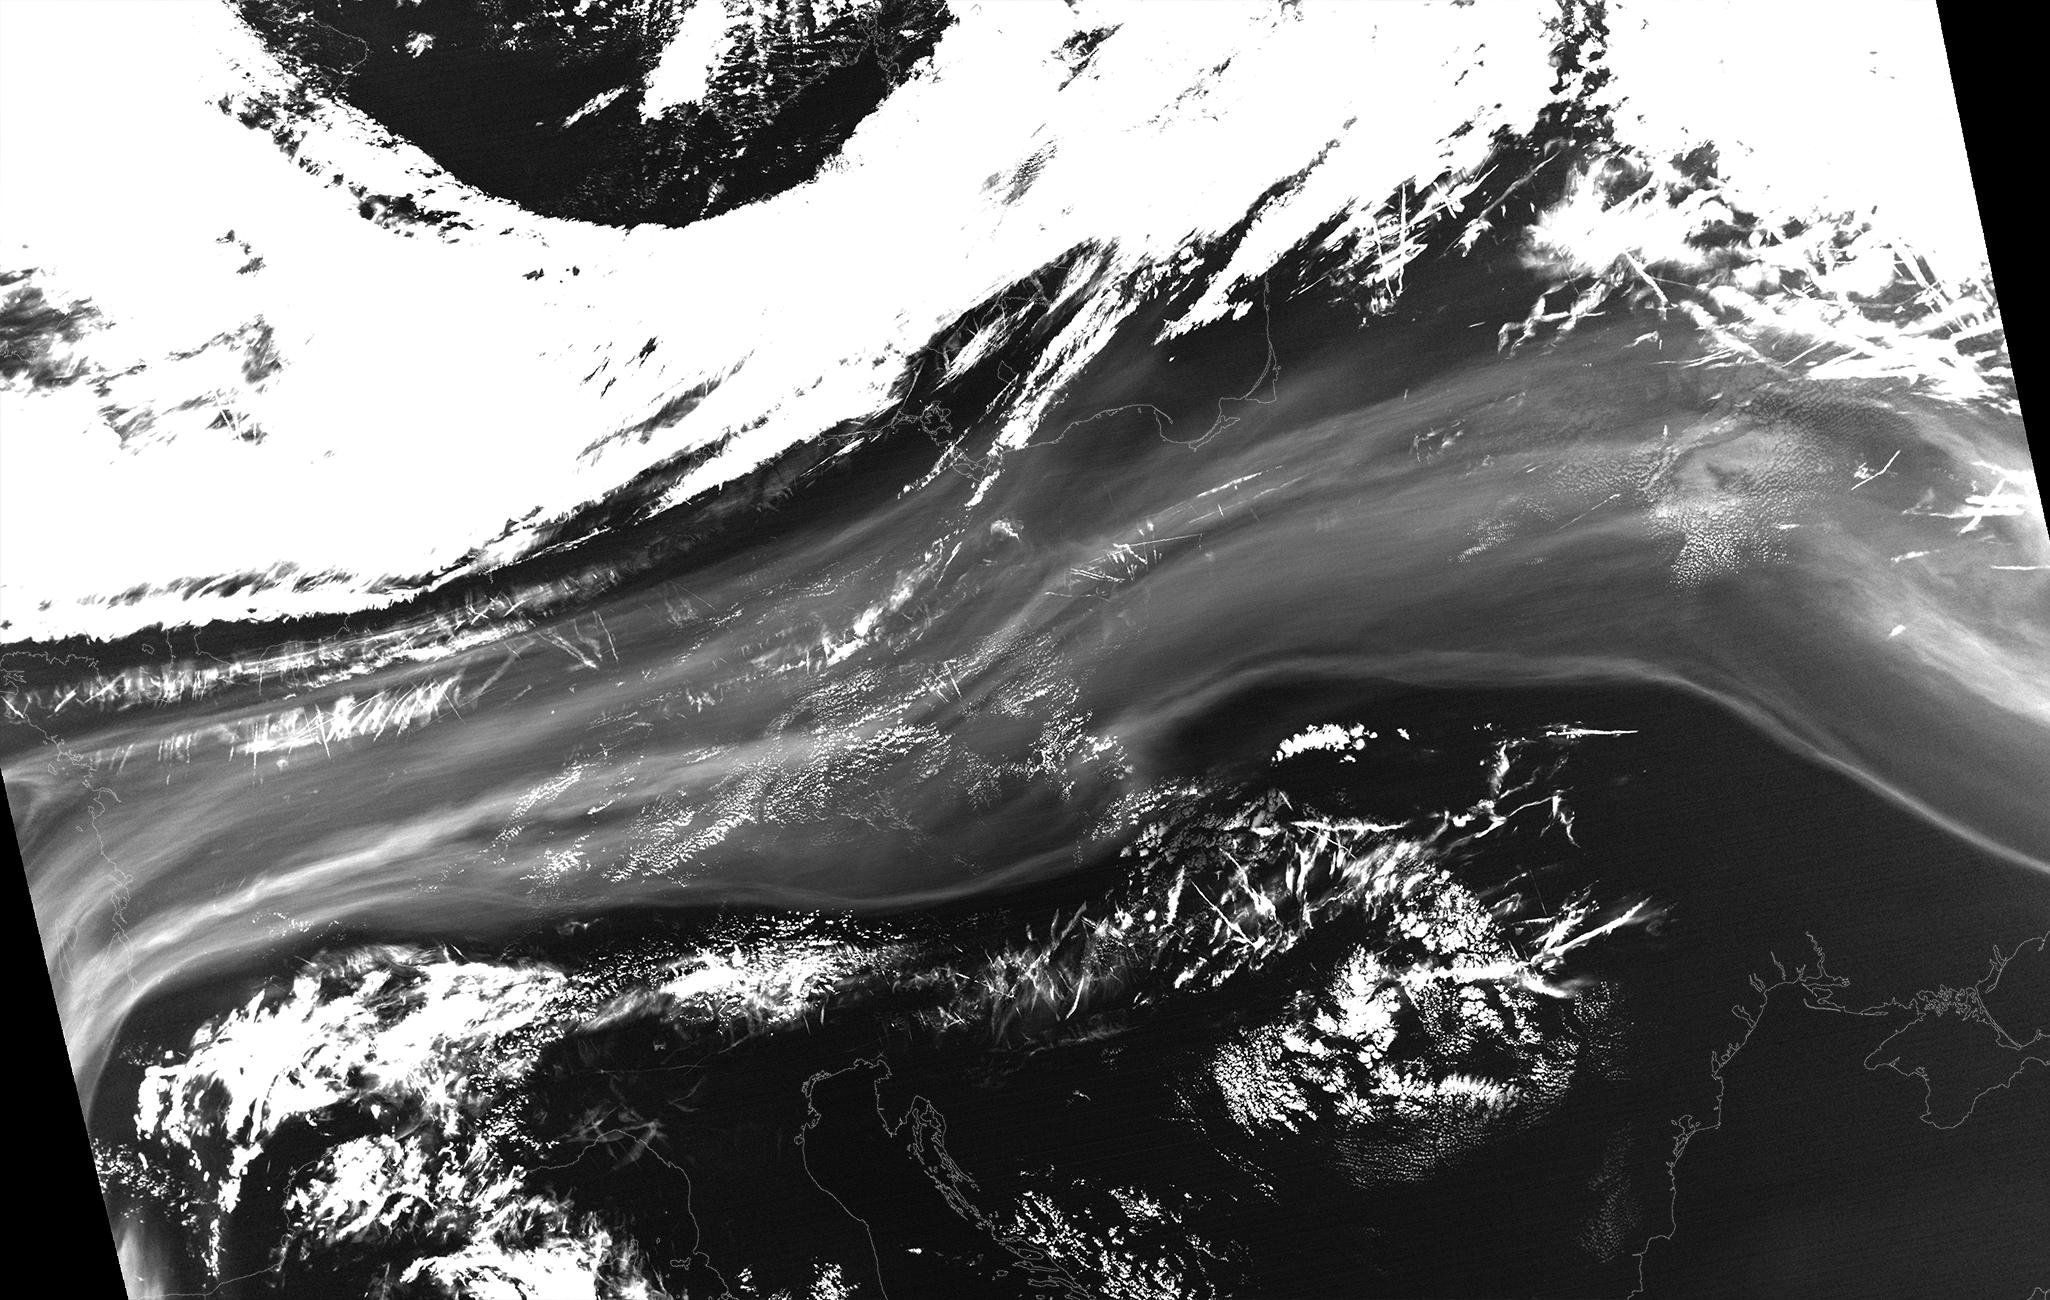 Figure 5: M9 reflectivity range from 0–0.75%